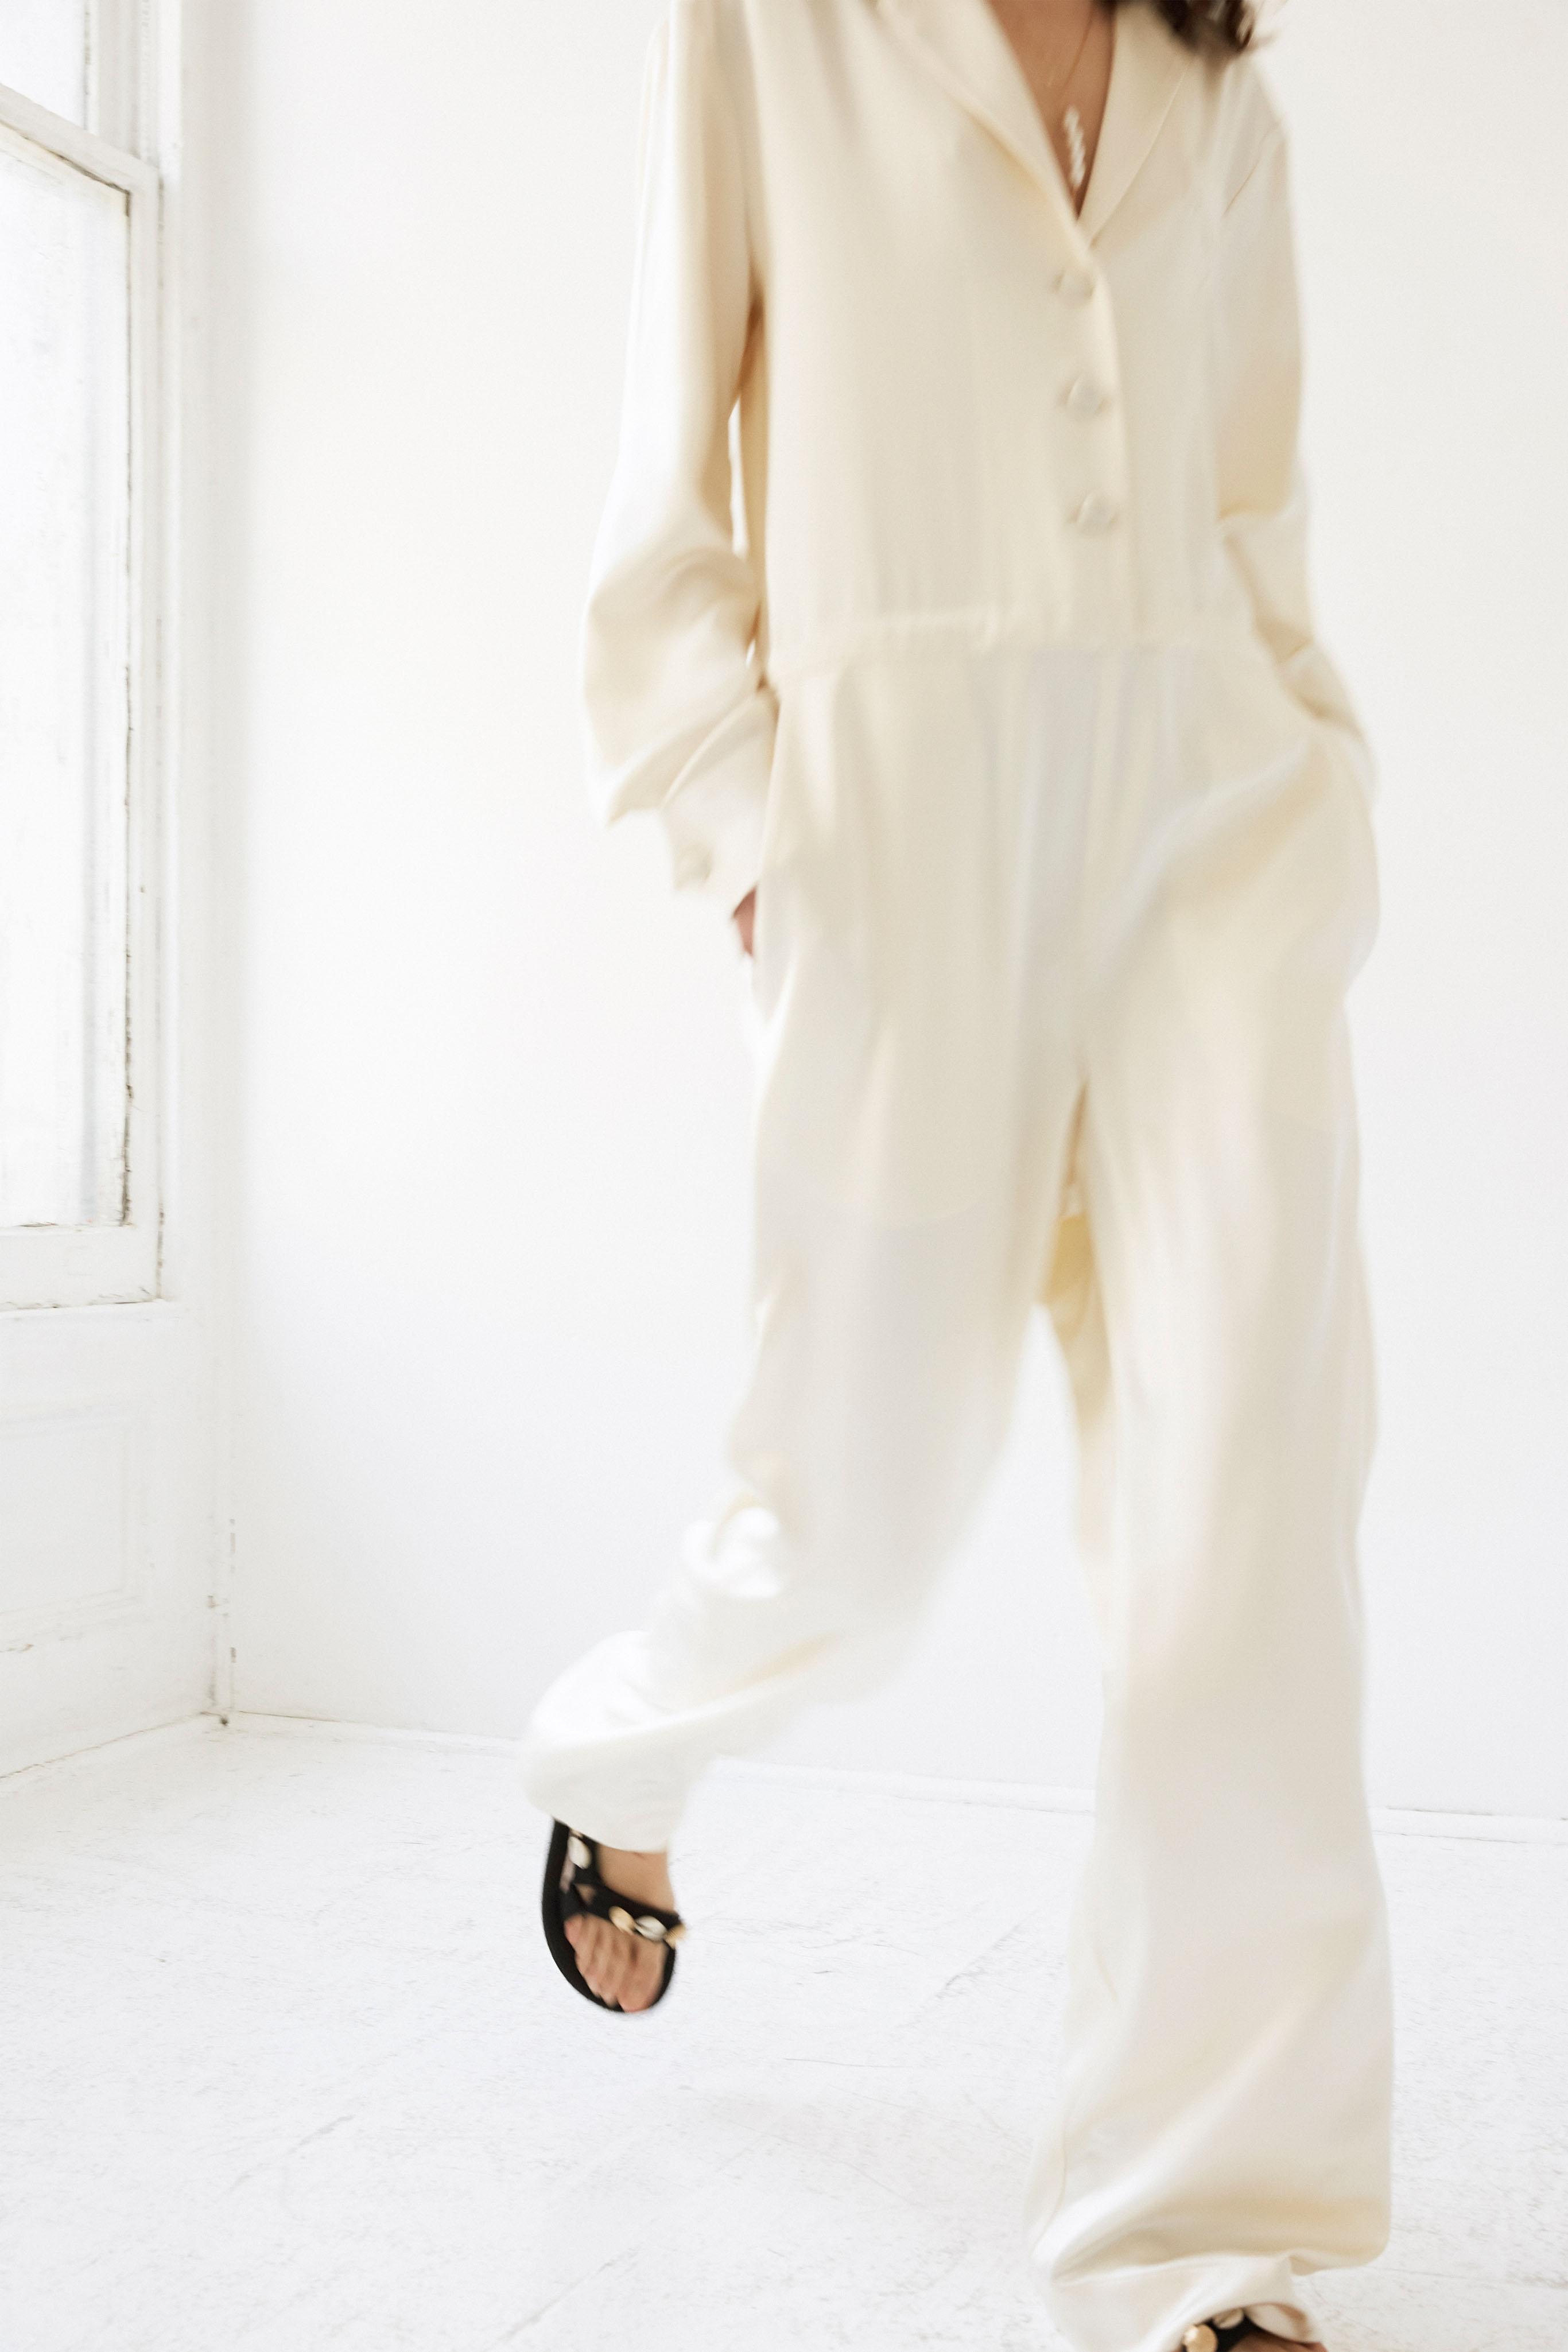 lein wedding dress spring 2020 long sleeve buttoned jumpsuit